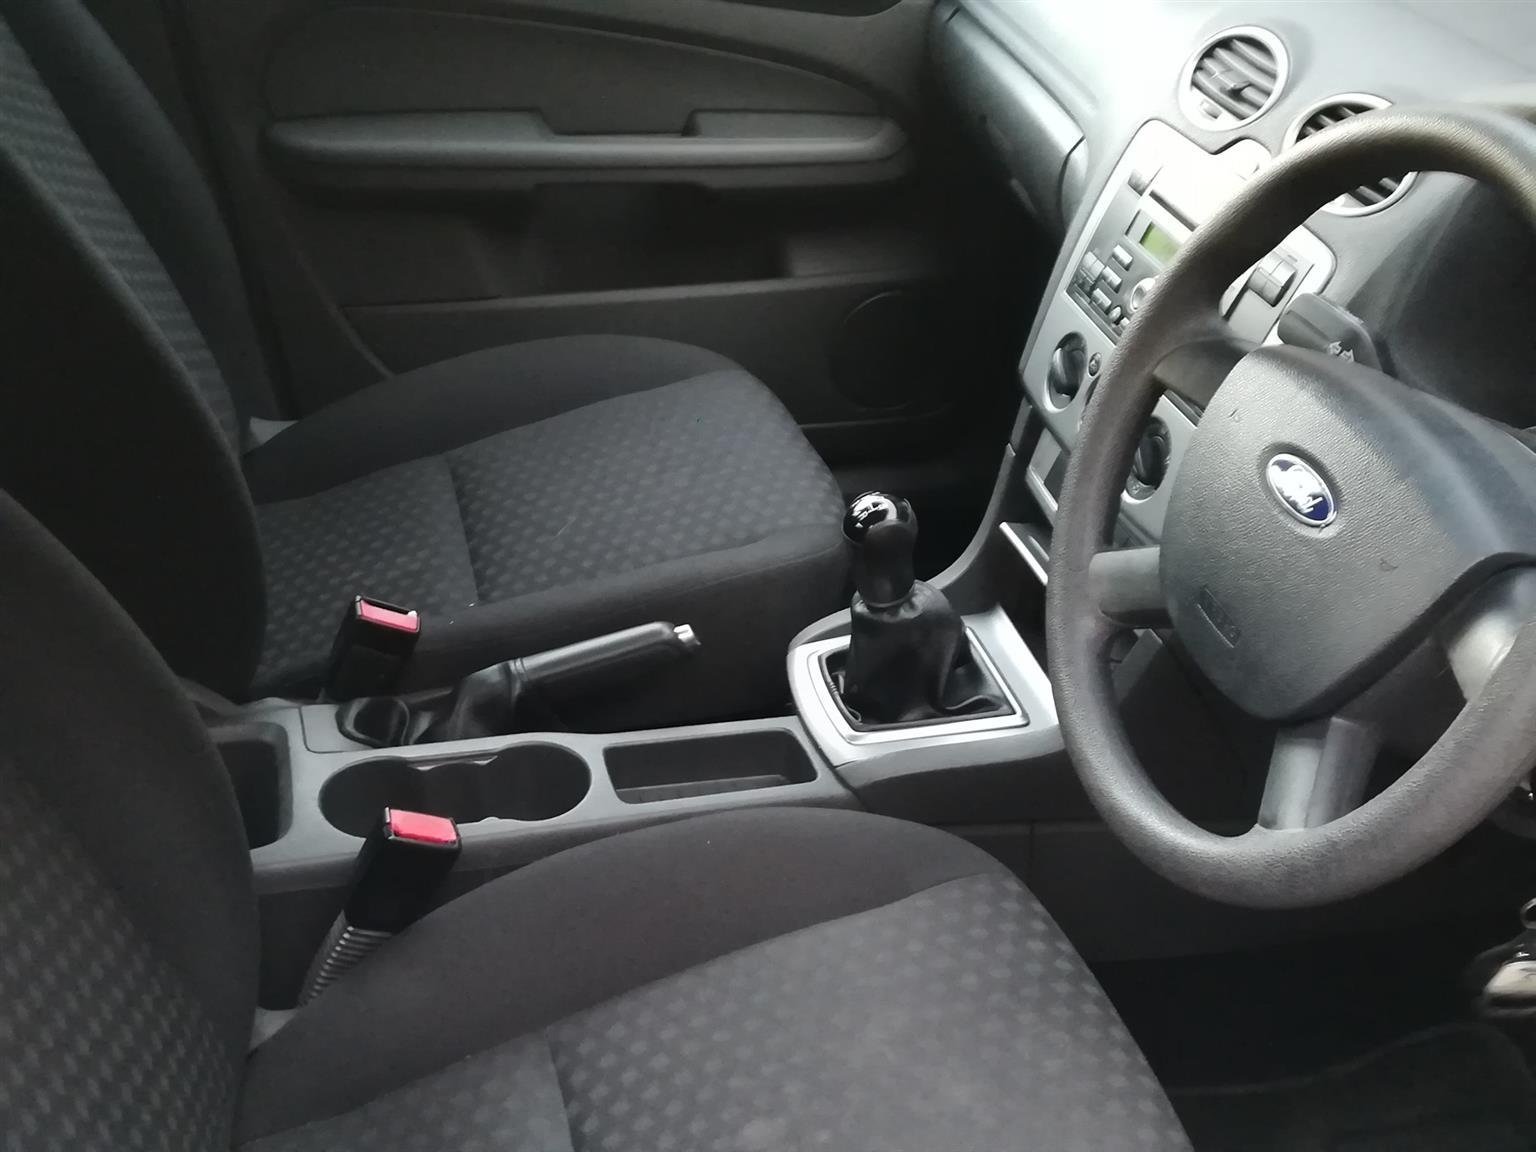 Ford Focus 1.6 4 door Ambiente